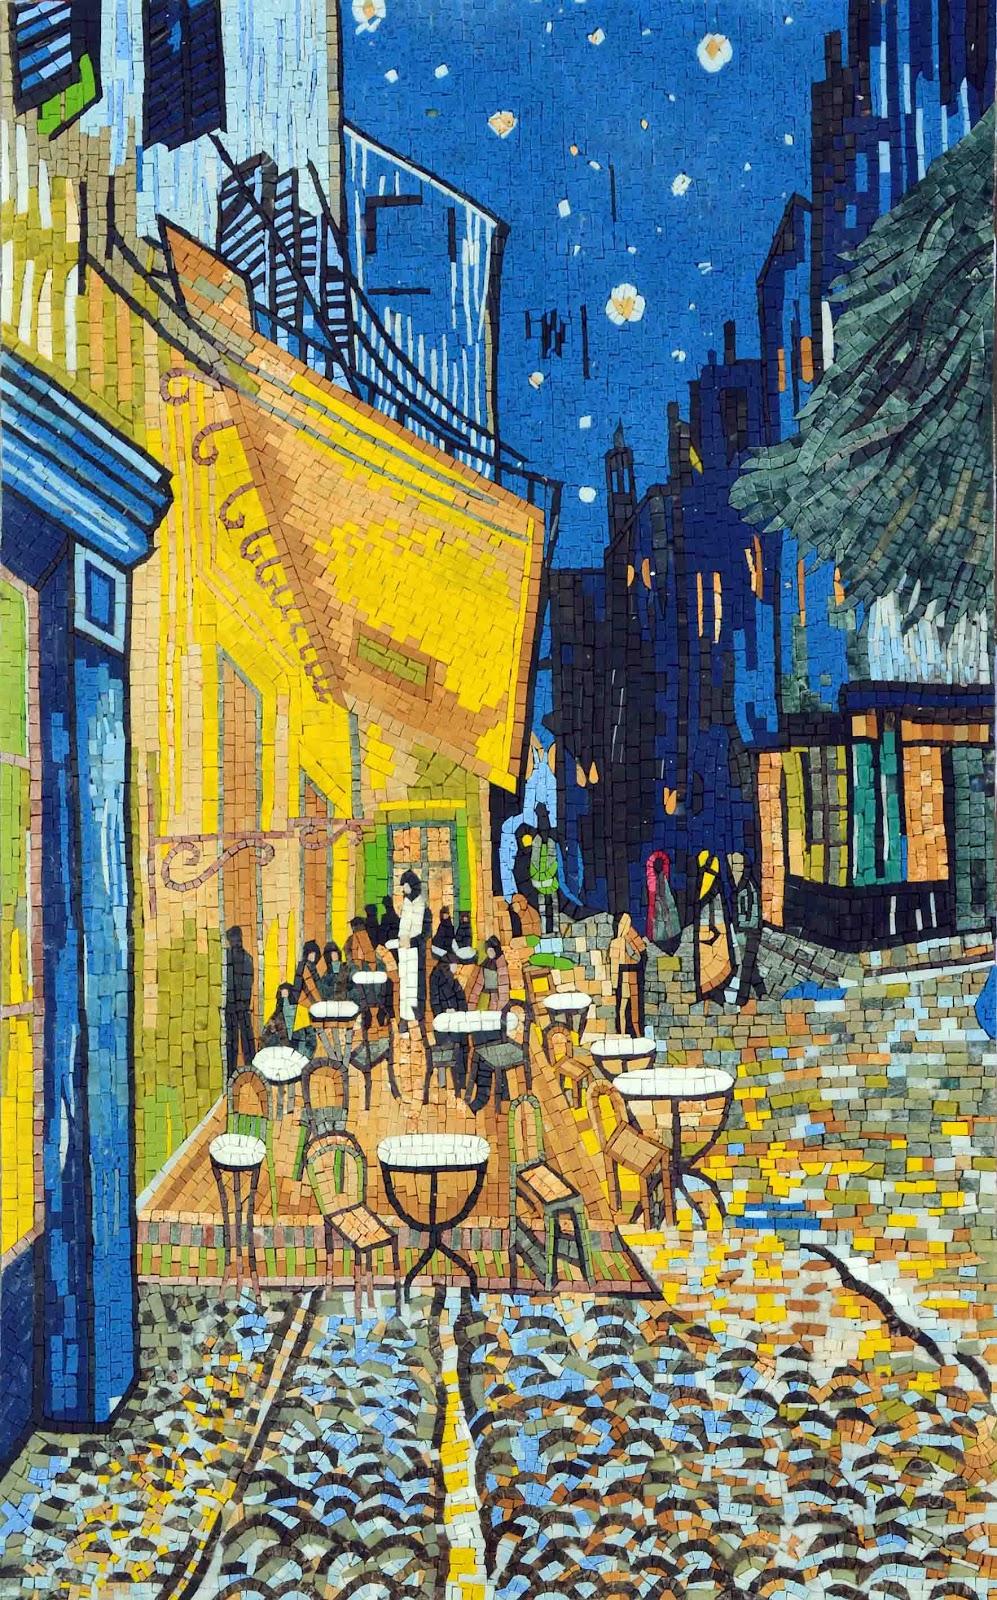 """ Cafe at Night"" by Vincent van Gogh - Mosaic Reproduction"